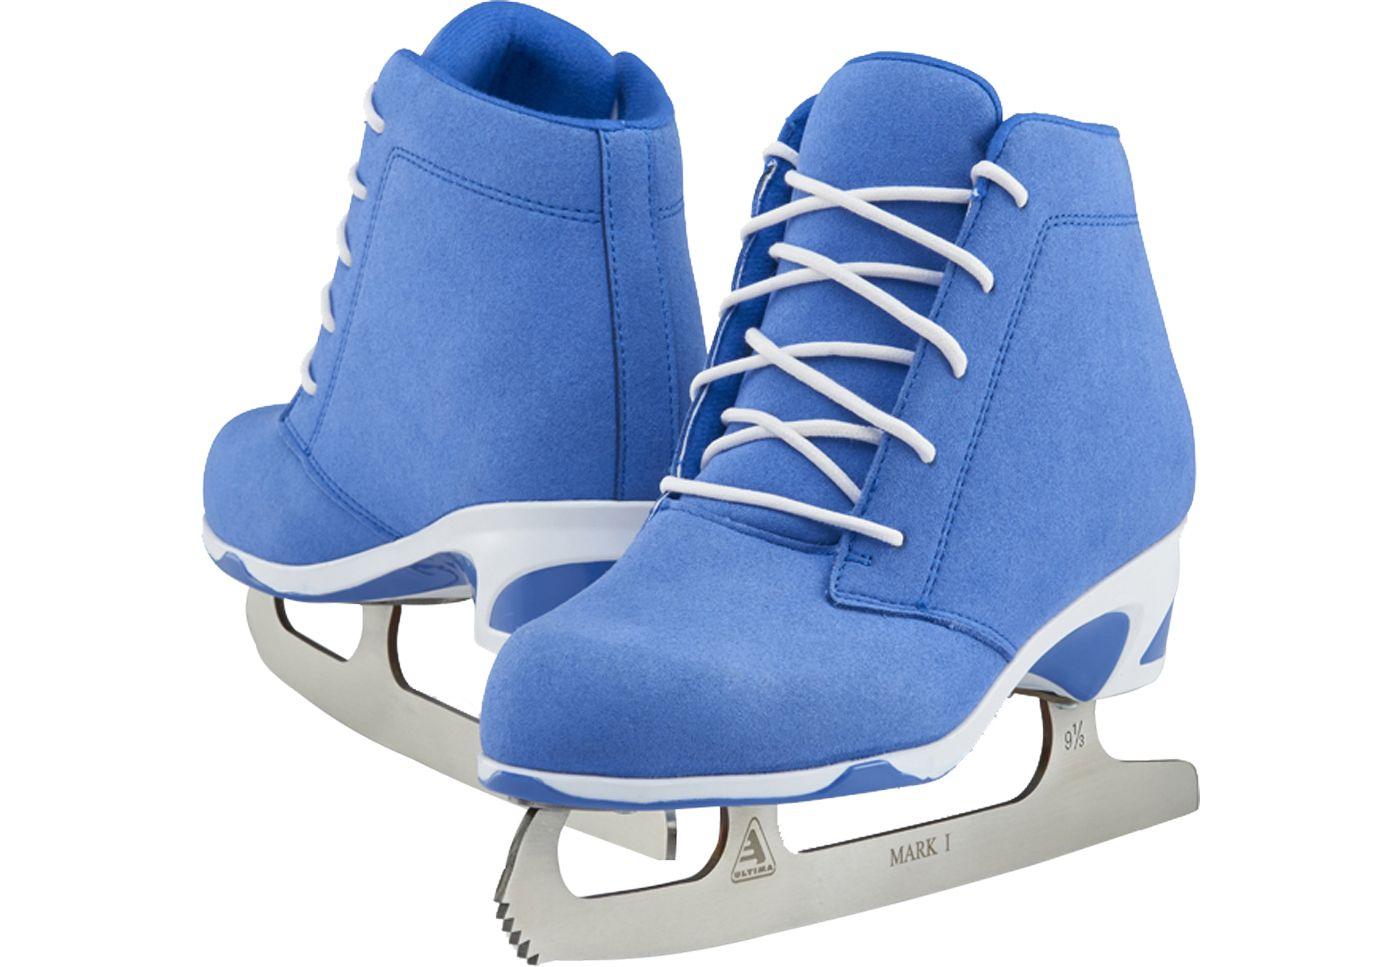 Jackson Ultima Women's Softec Diva Figure Skates